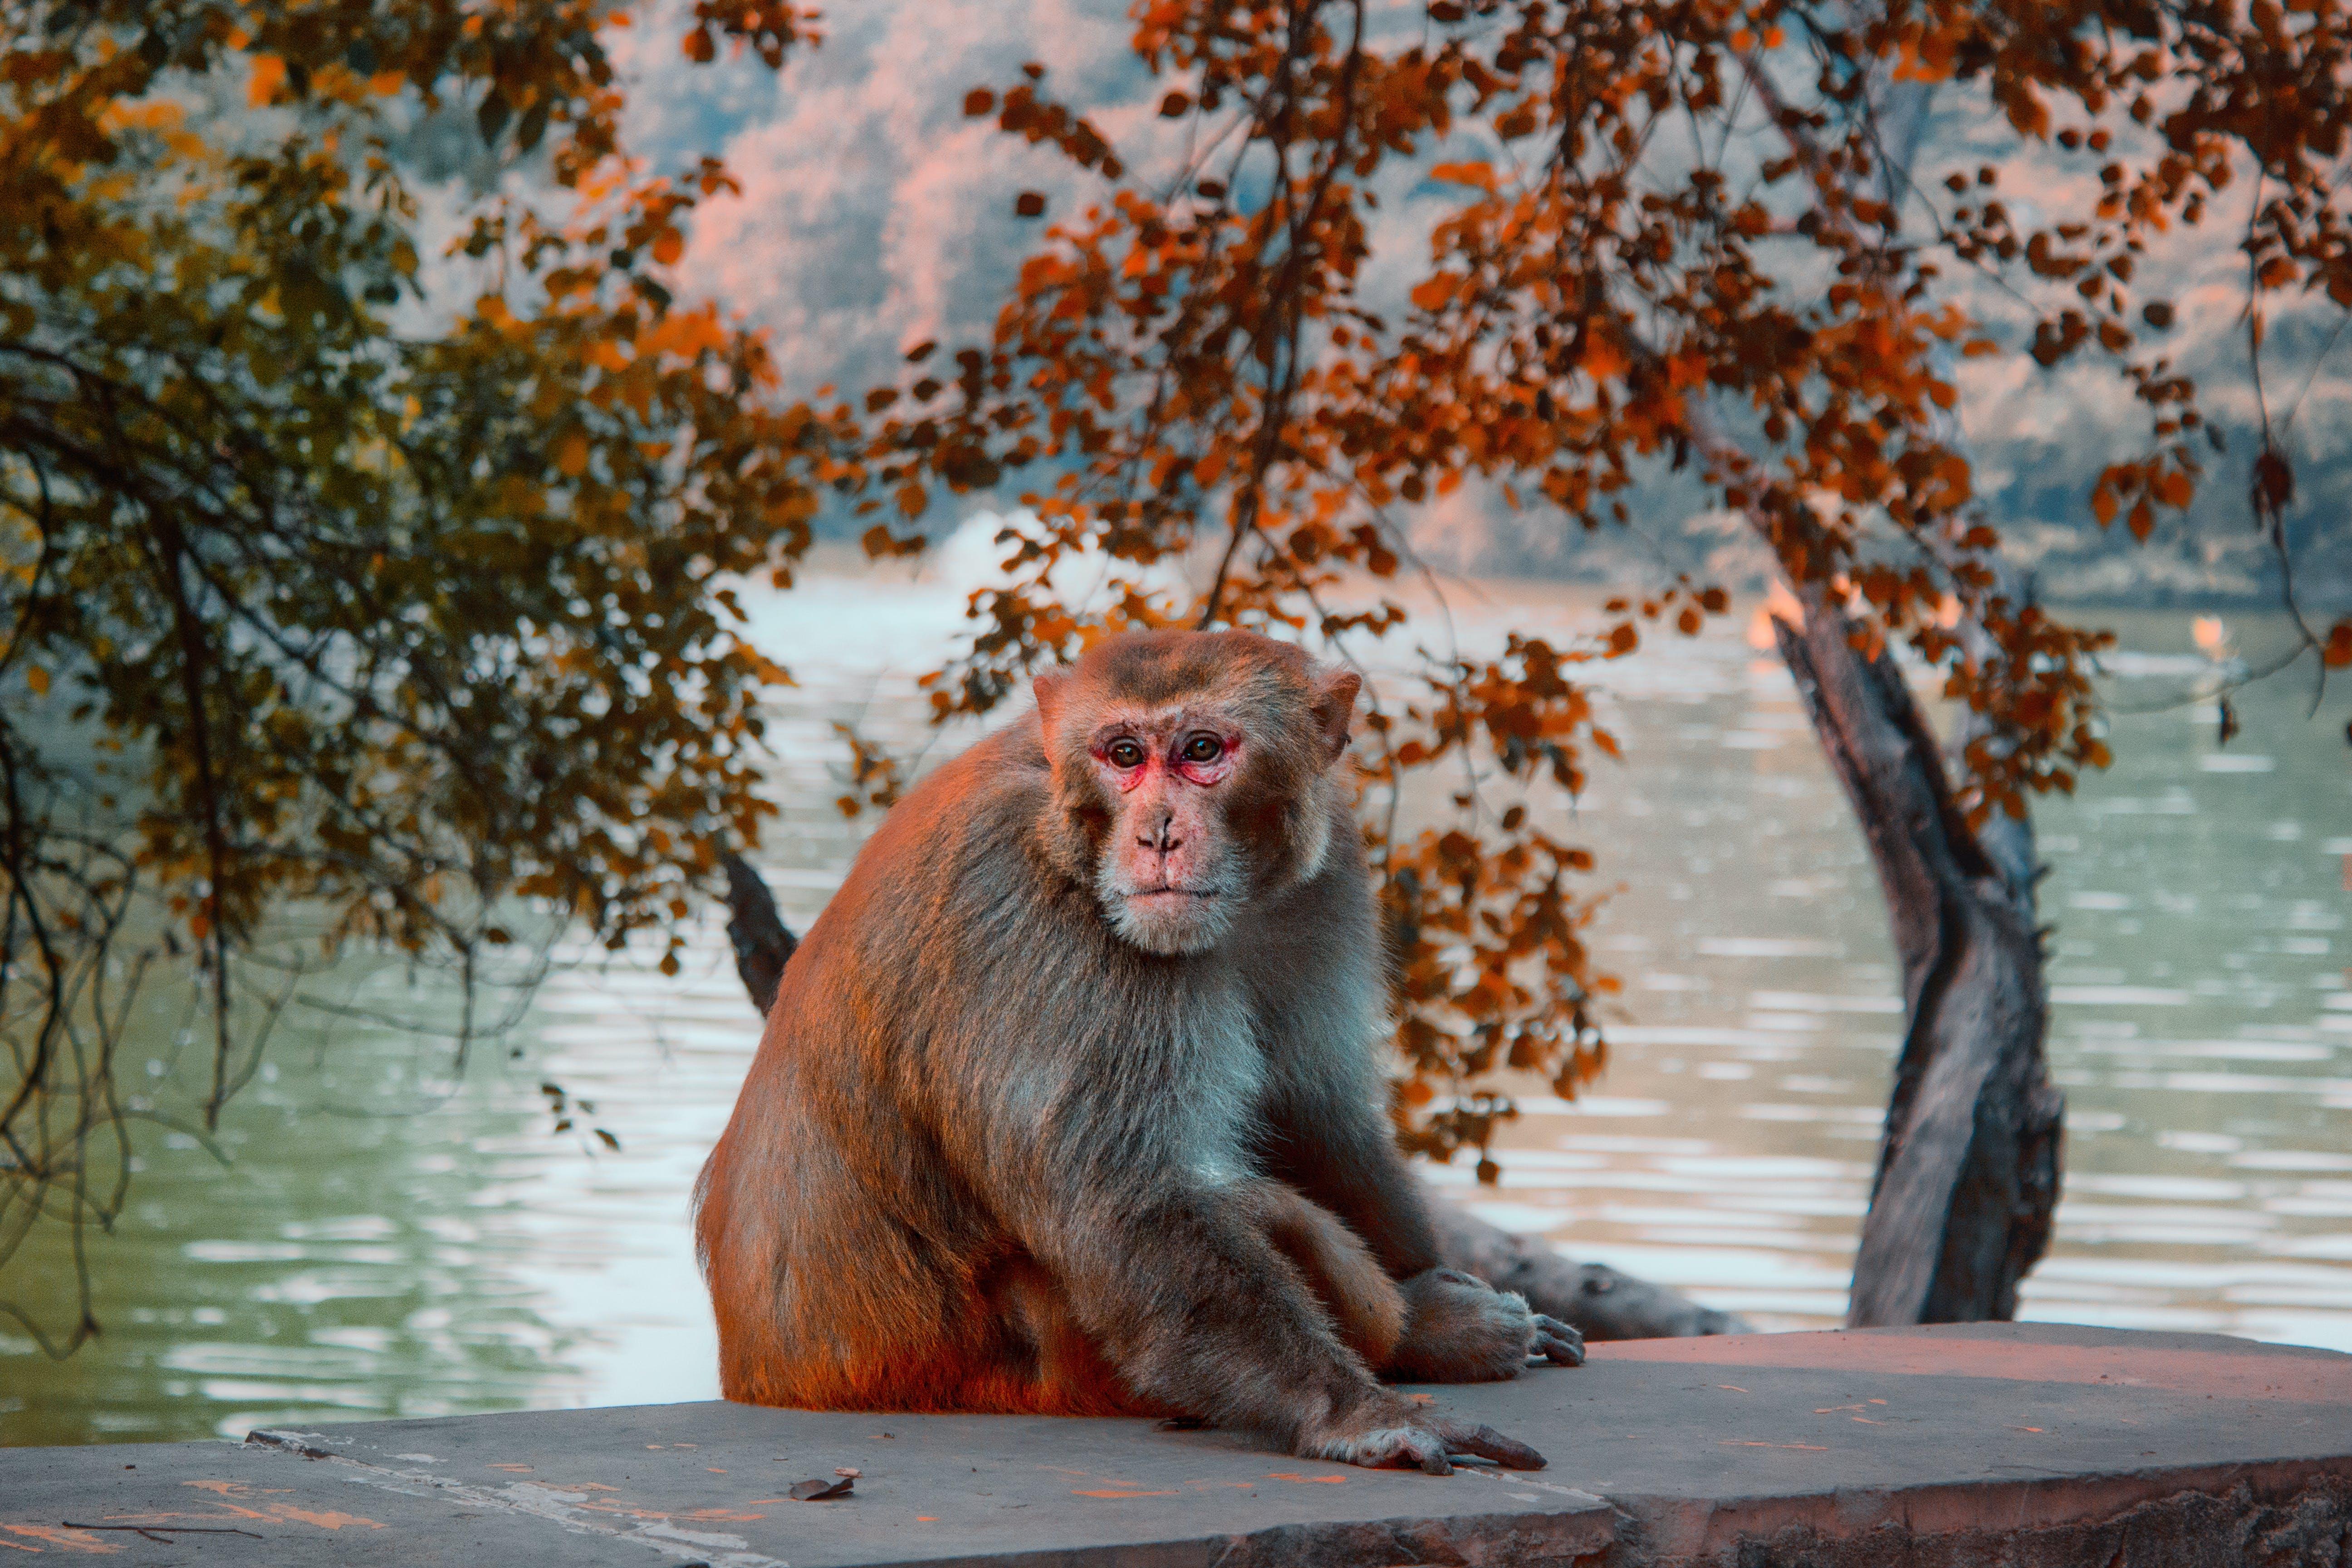 Photo of Brown Monkey Sitting Stone Pavement Near Body of Water